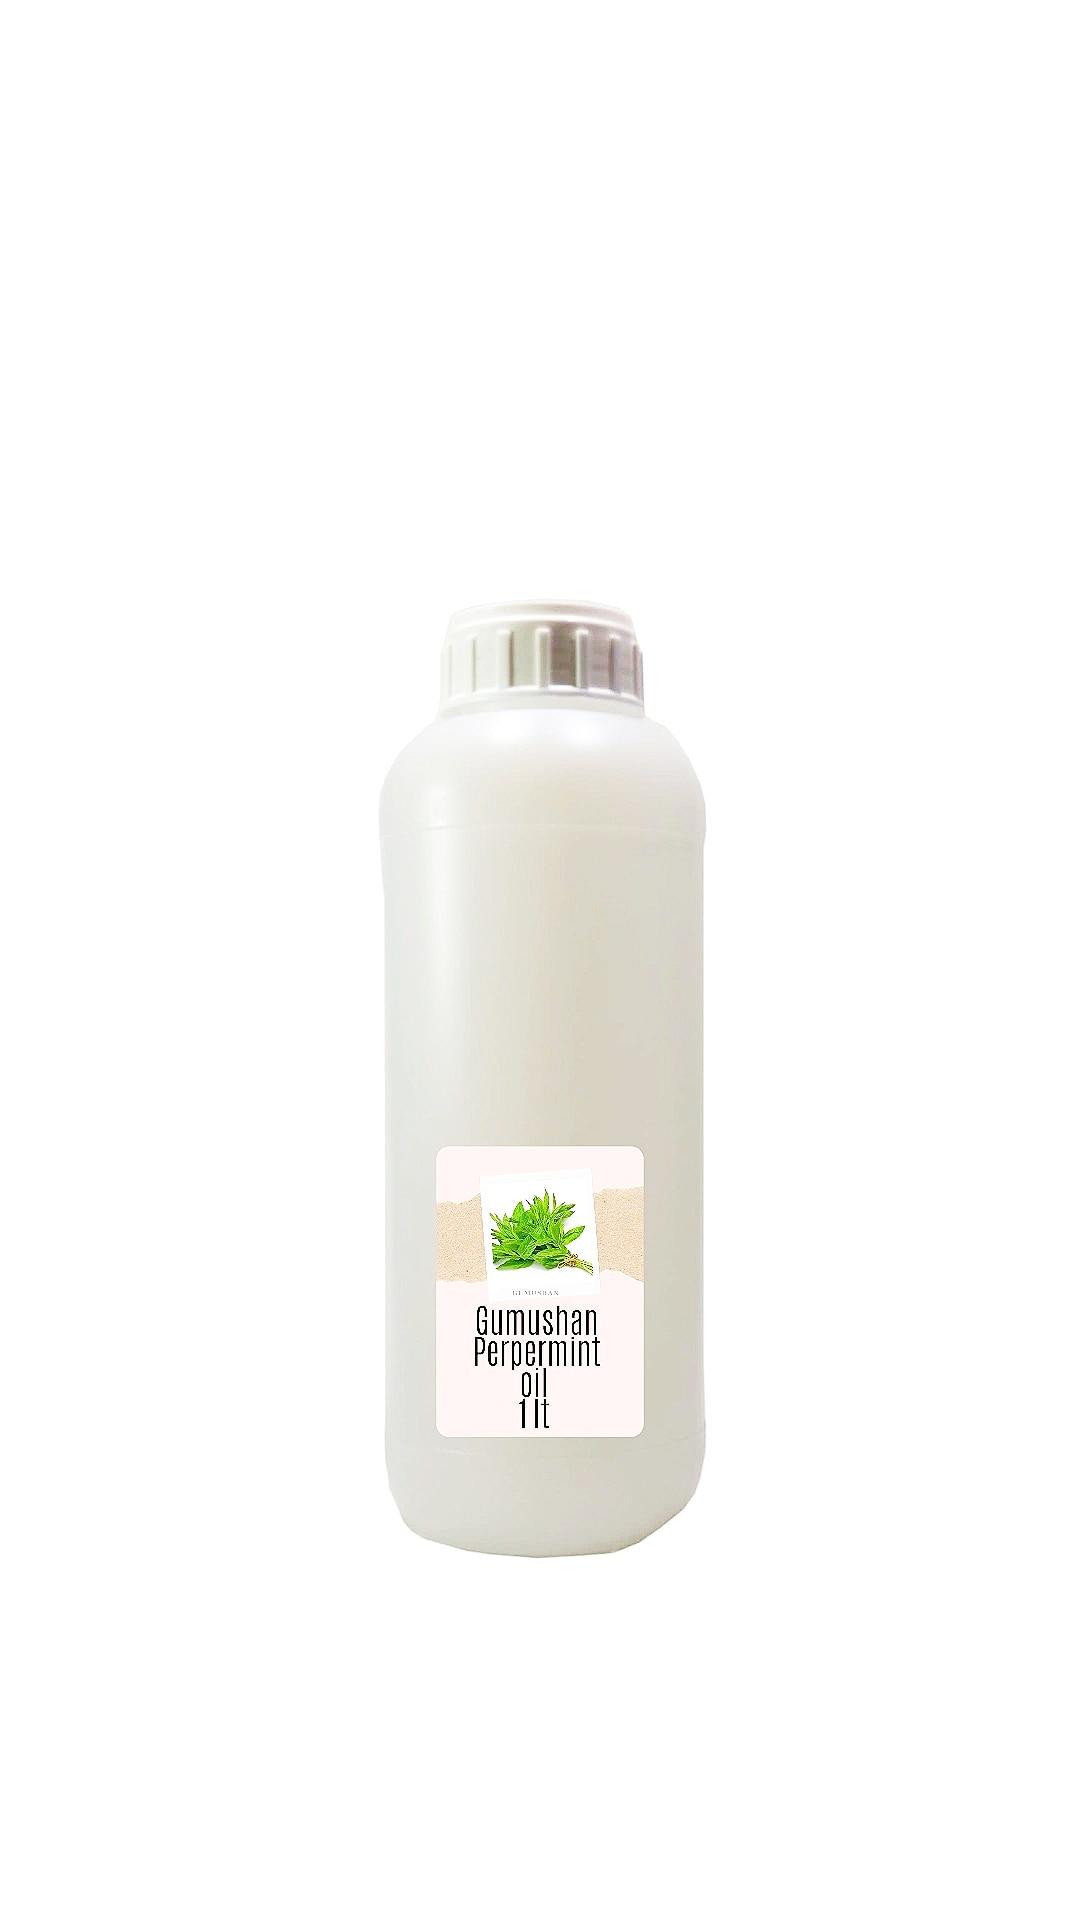 High quality pure Peppermint Oil 1 liter 34 fl oz 1000ml